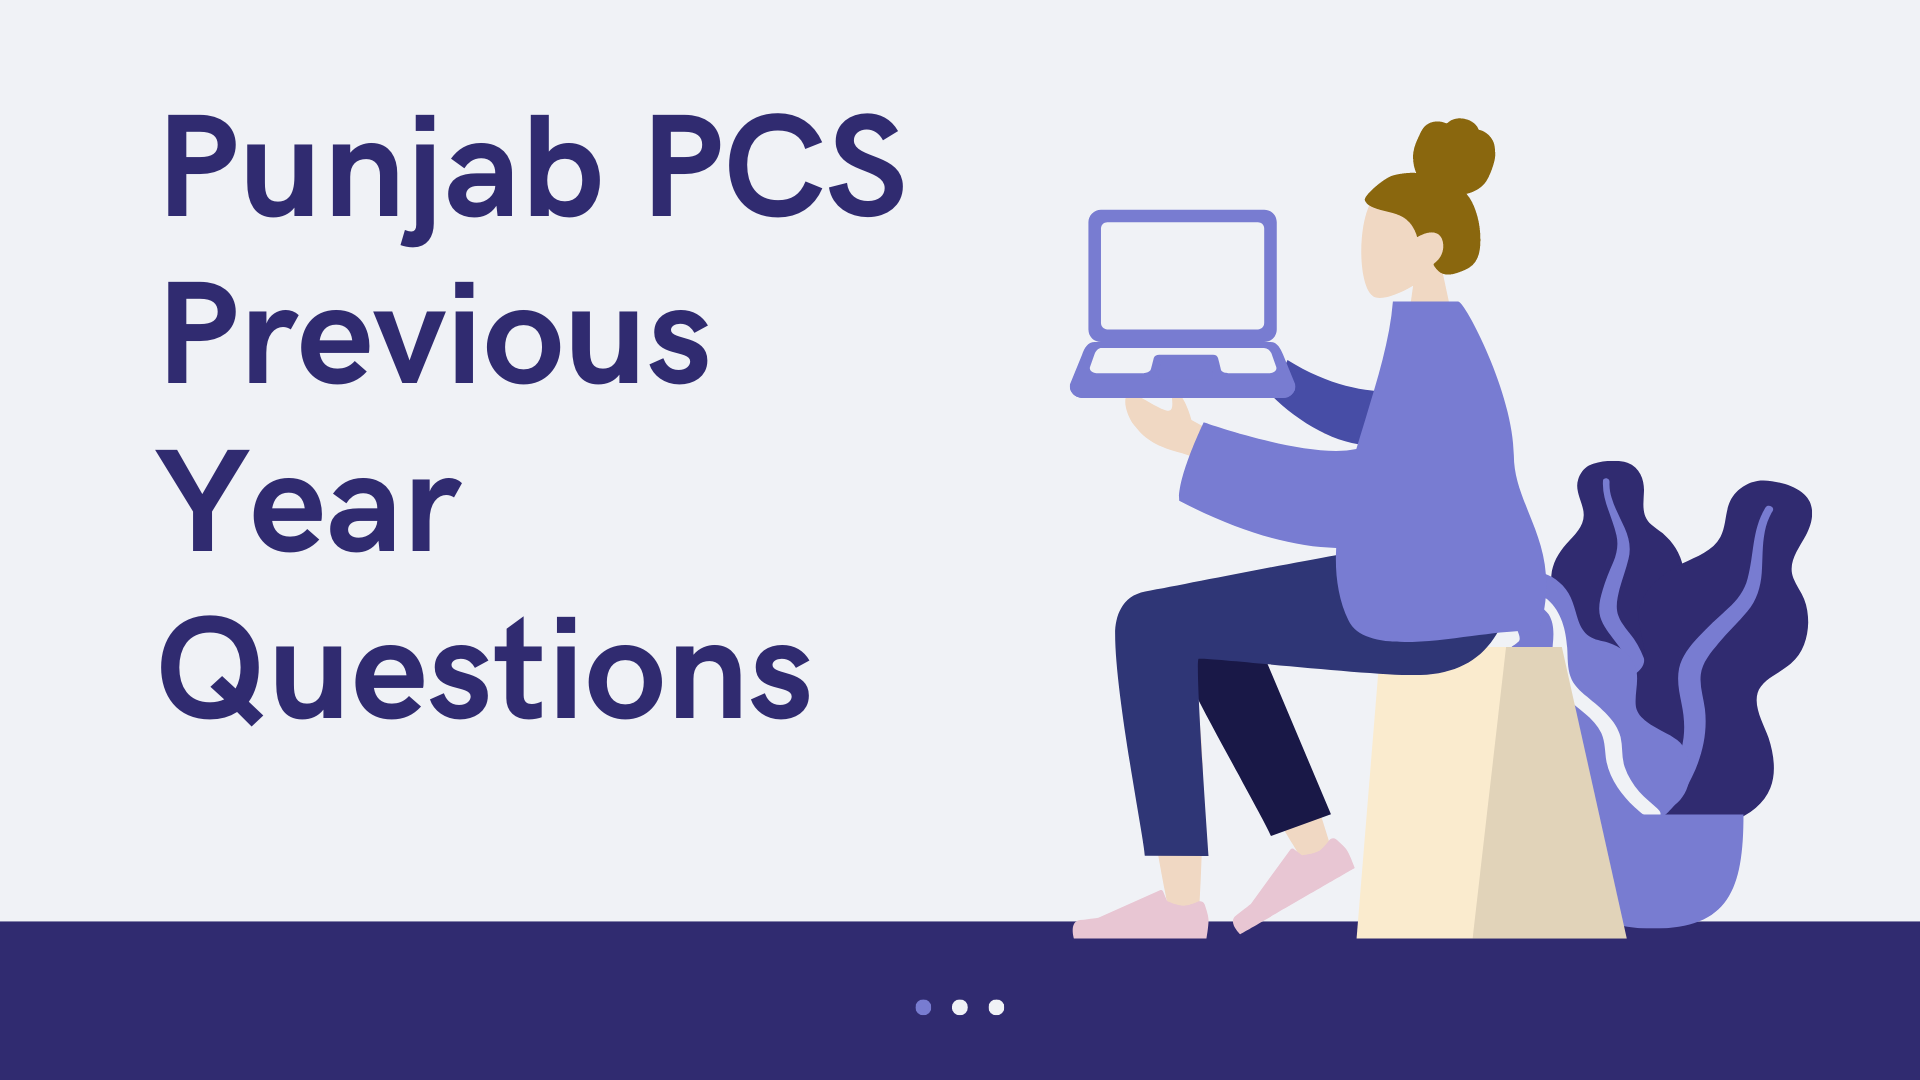 Punjab PCS 2021 Previous Year questions: Part 3